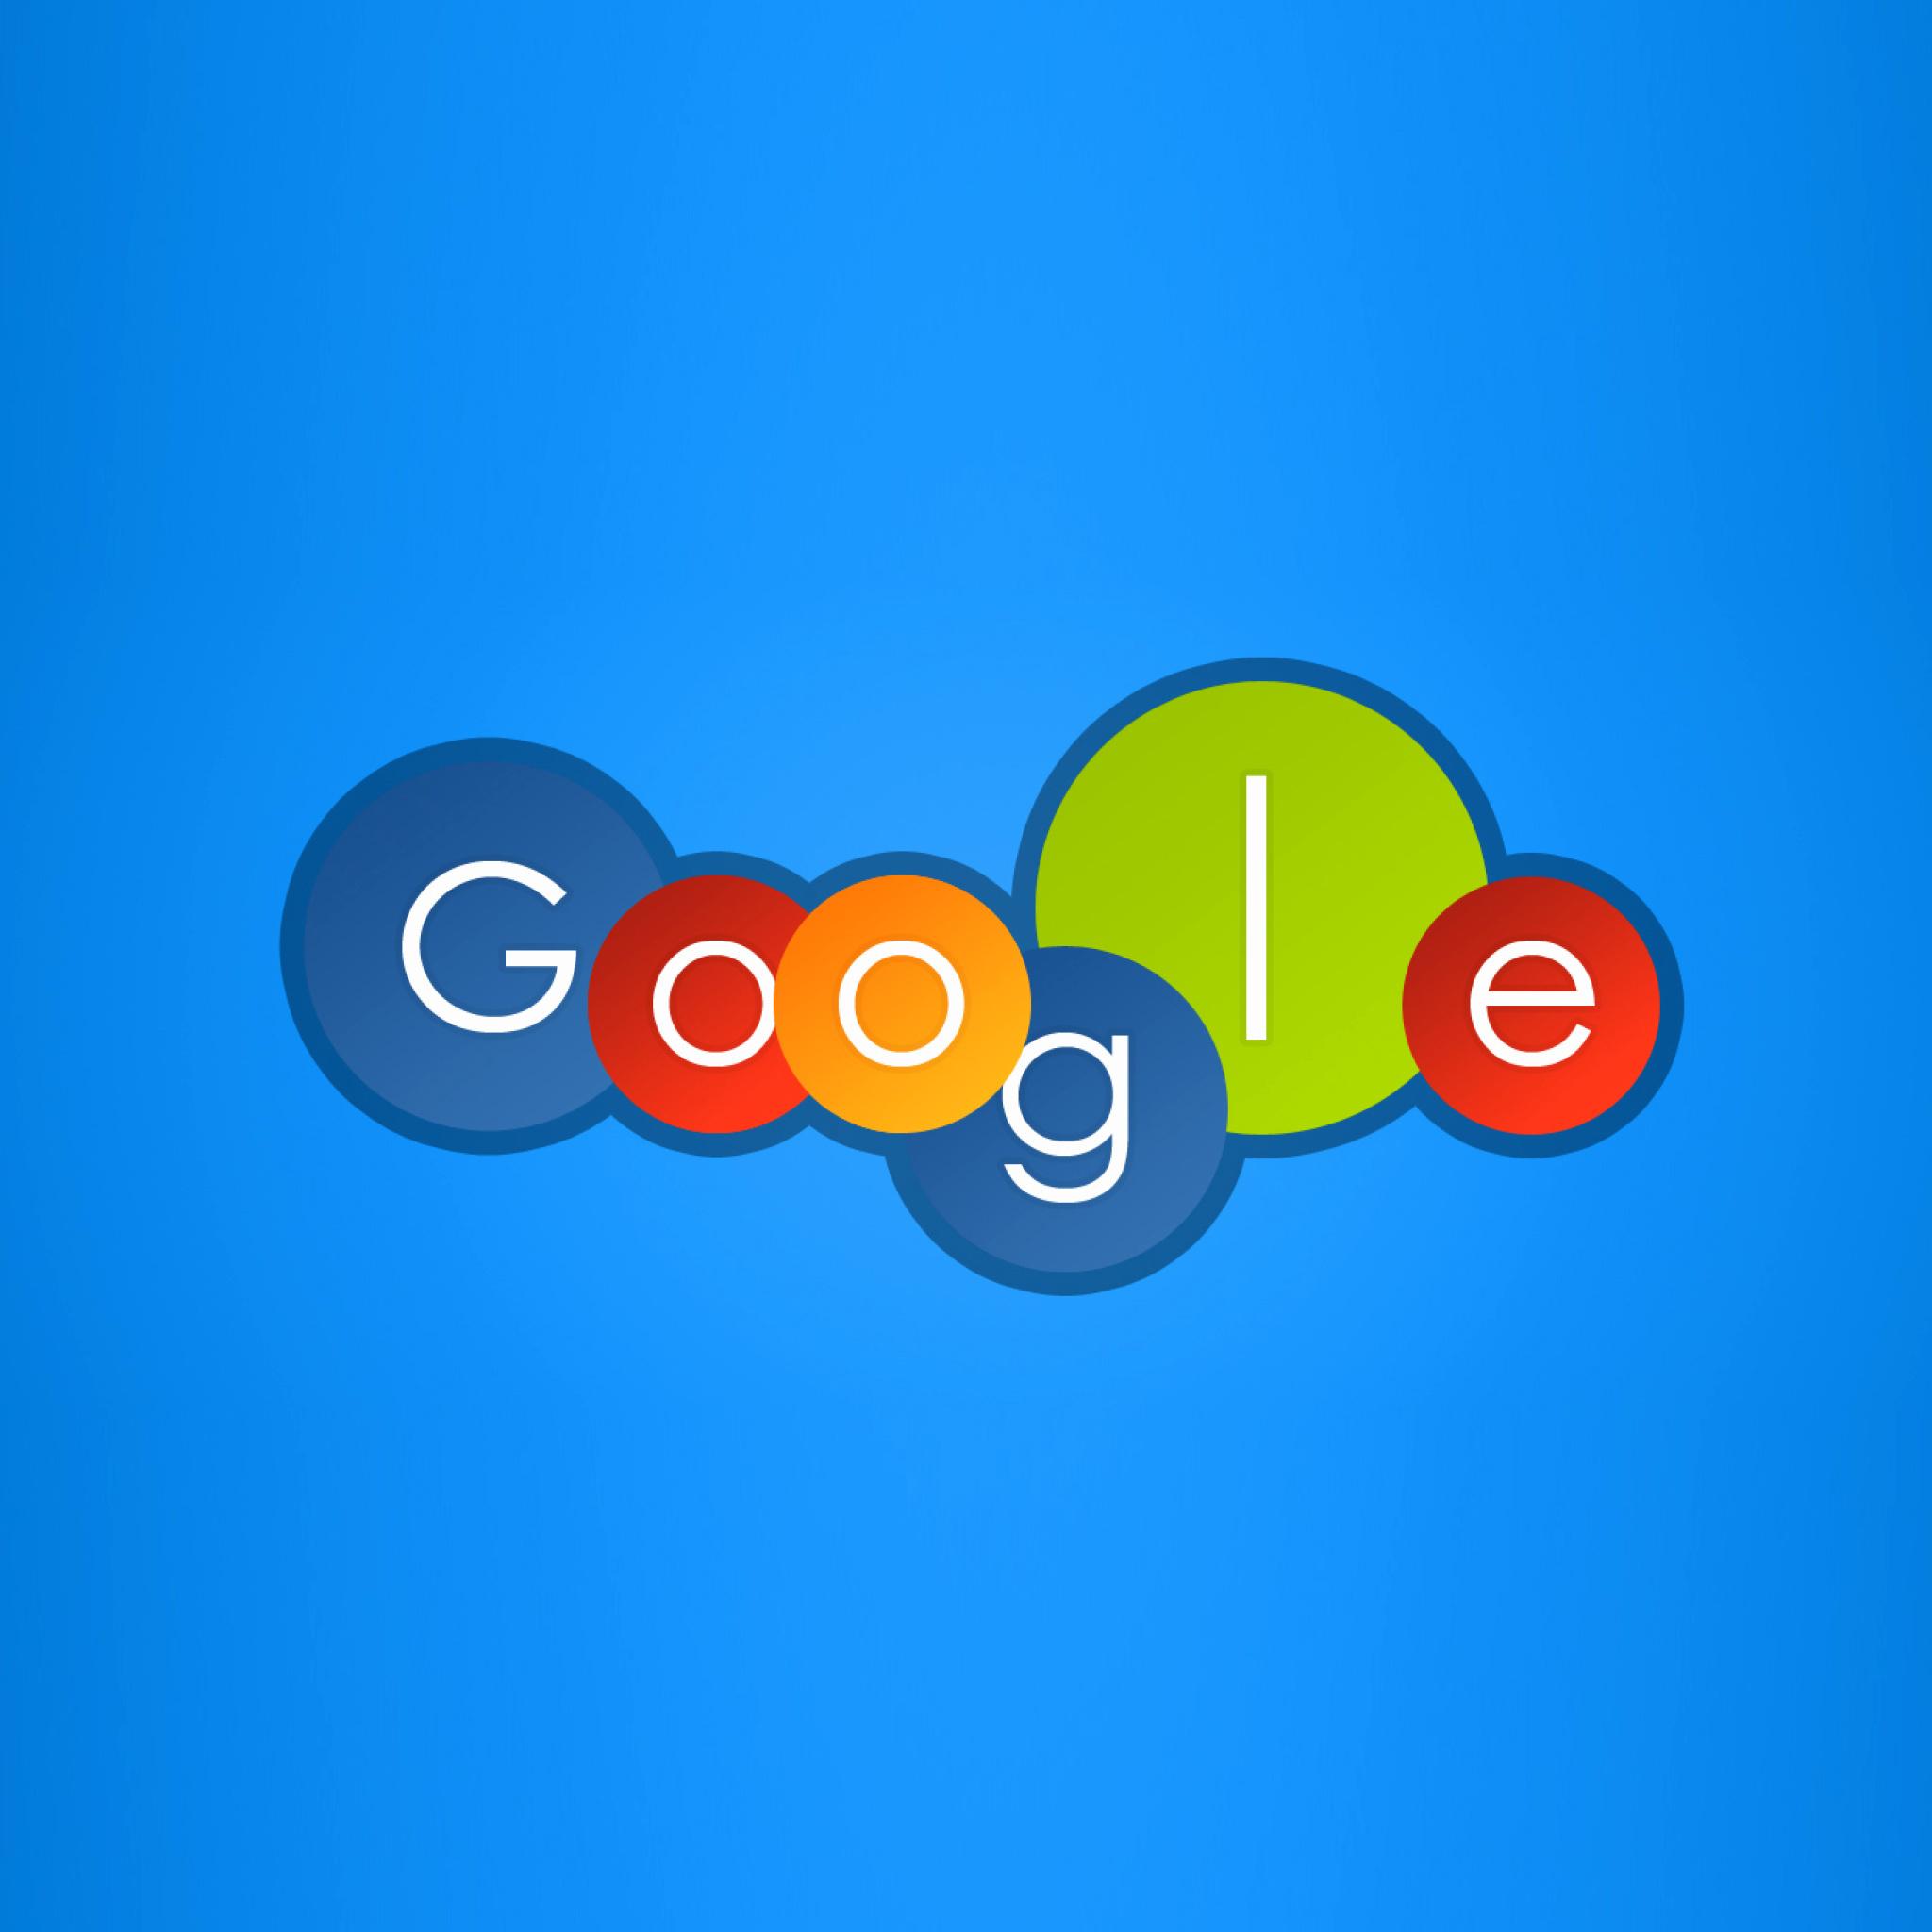 Гугл открытка для арутяна, пиджаки для мужчин